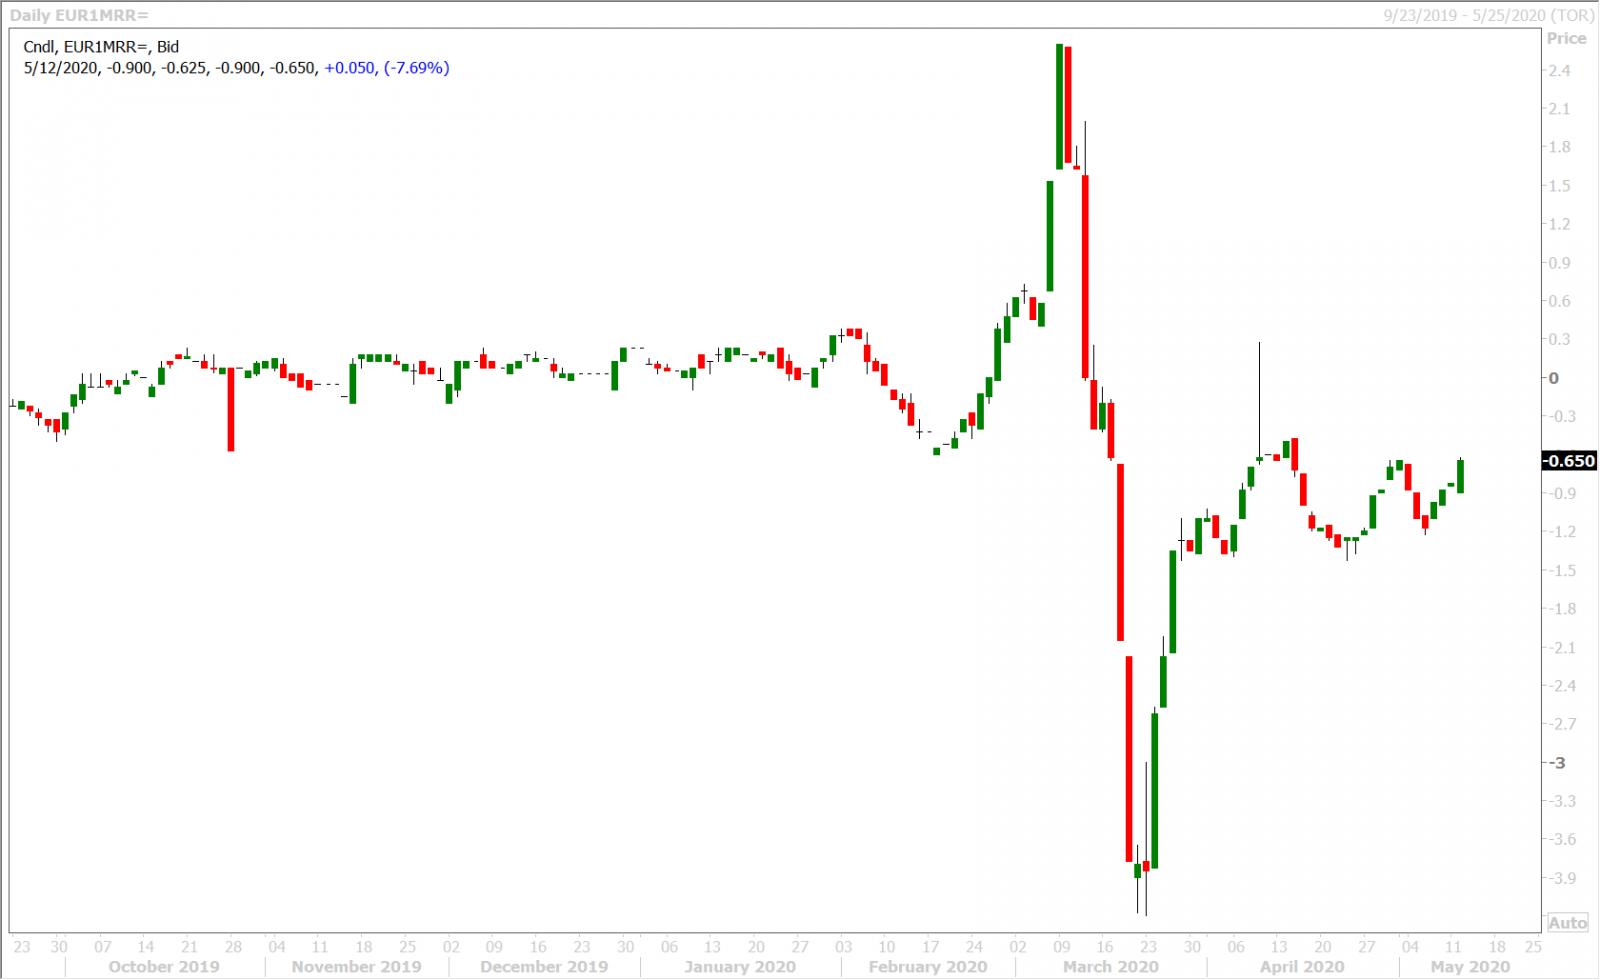 EURUSD 1-MONTH RISK REVERSAL DAILY